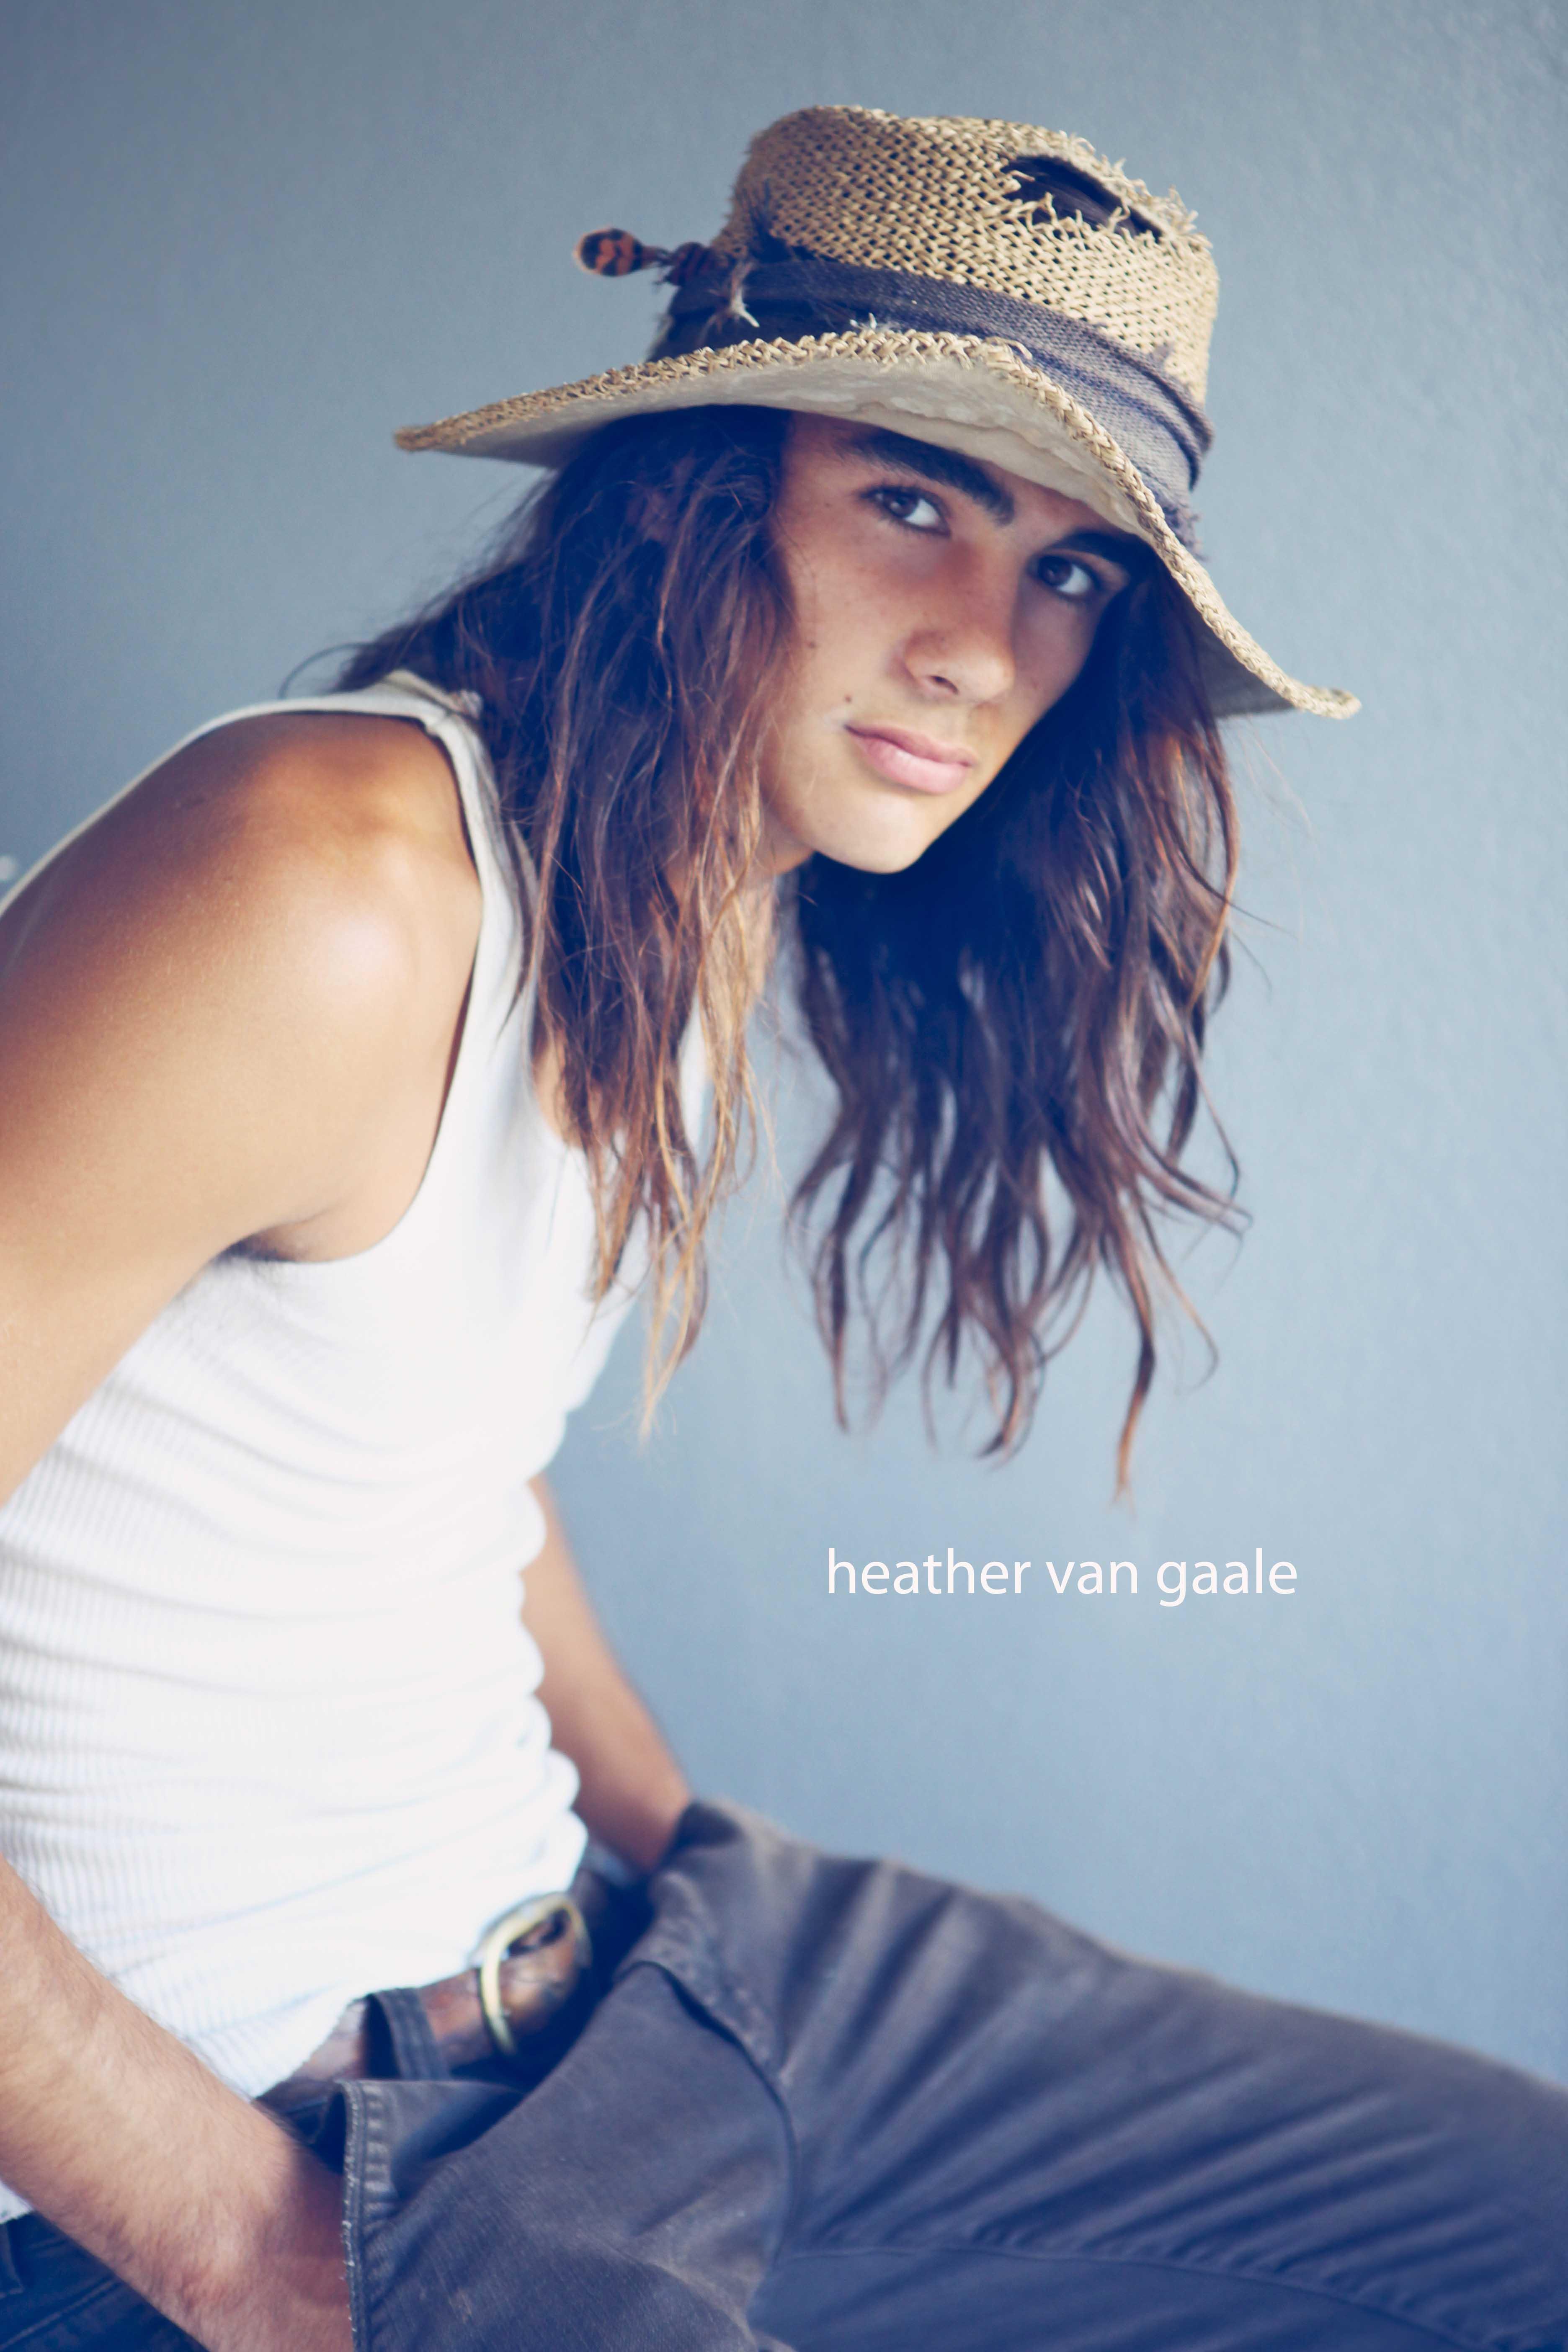 long hair skater model youth teen los angeles